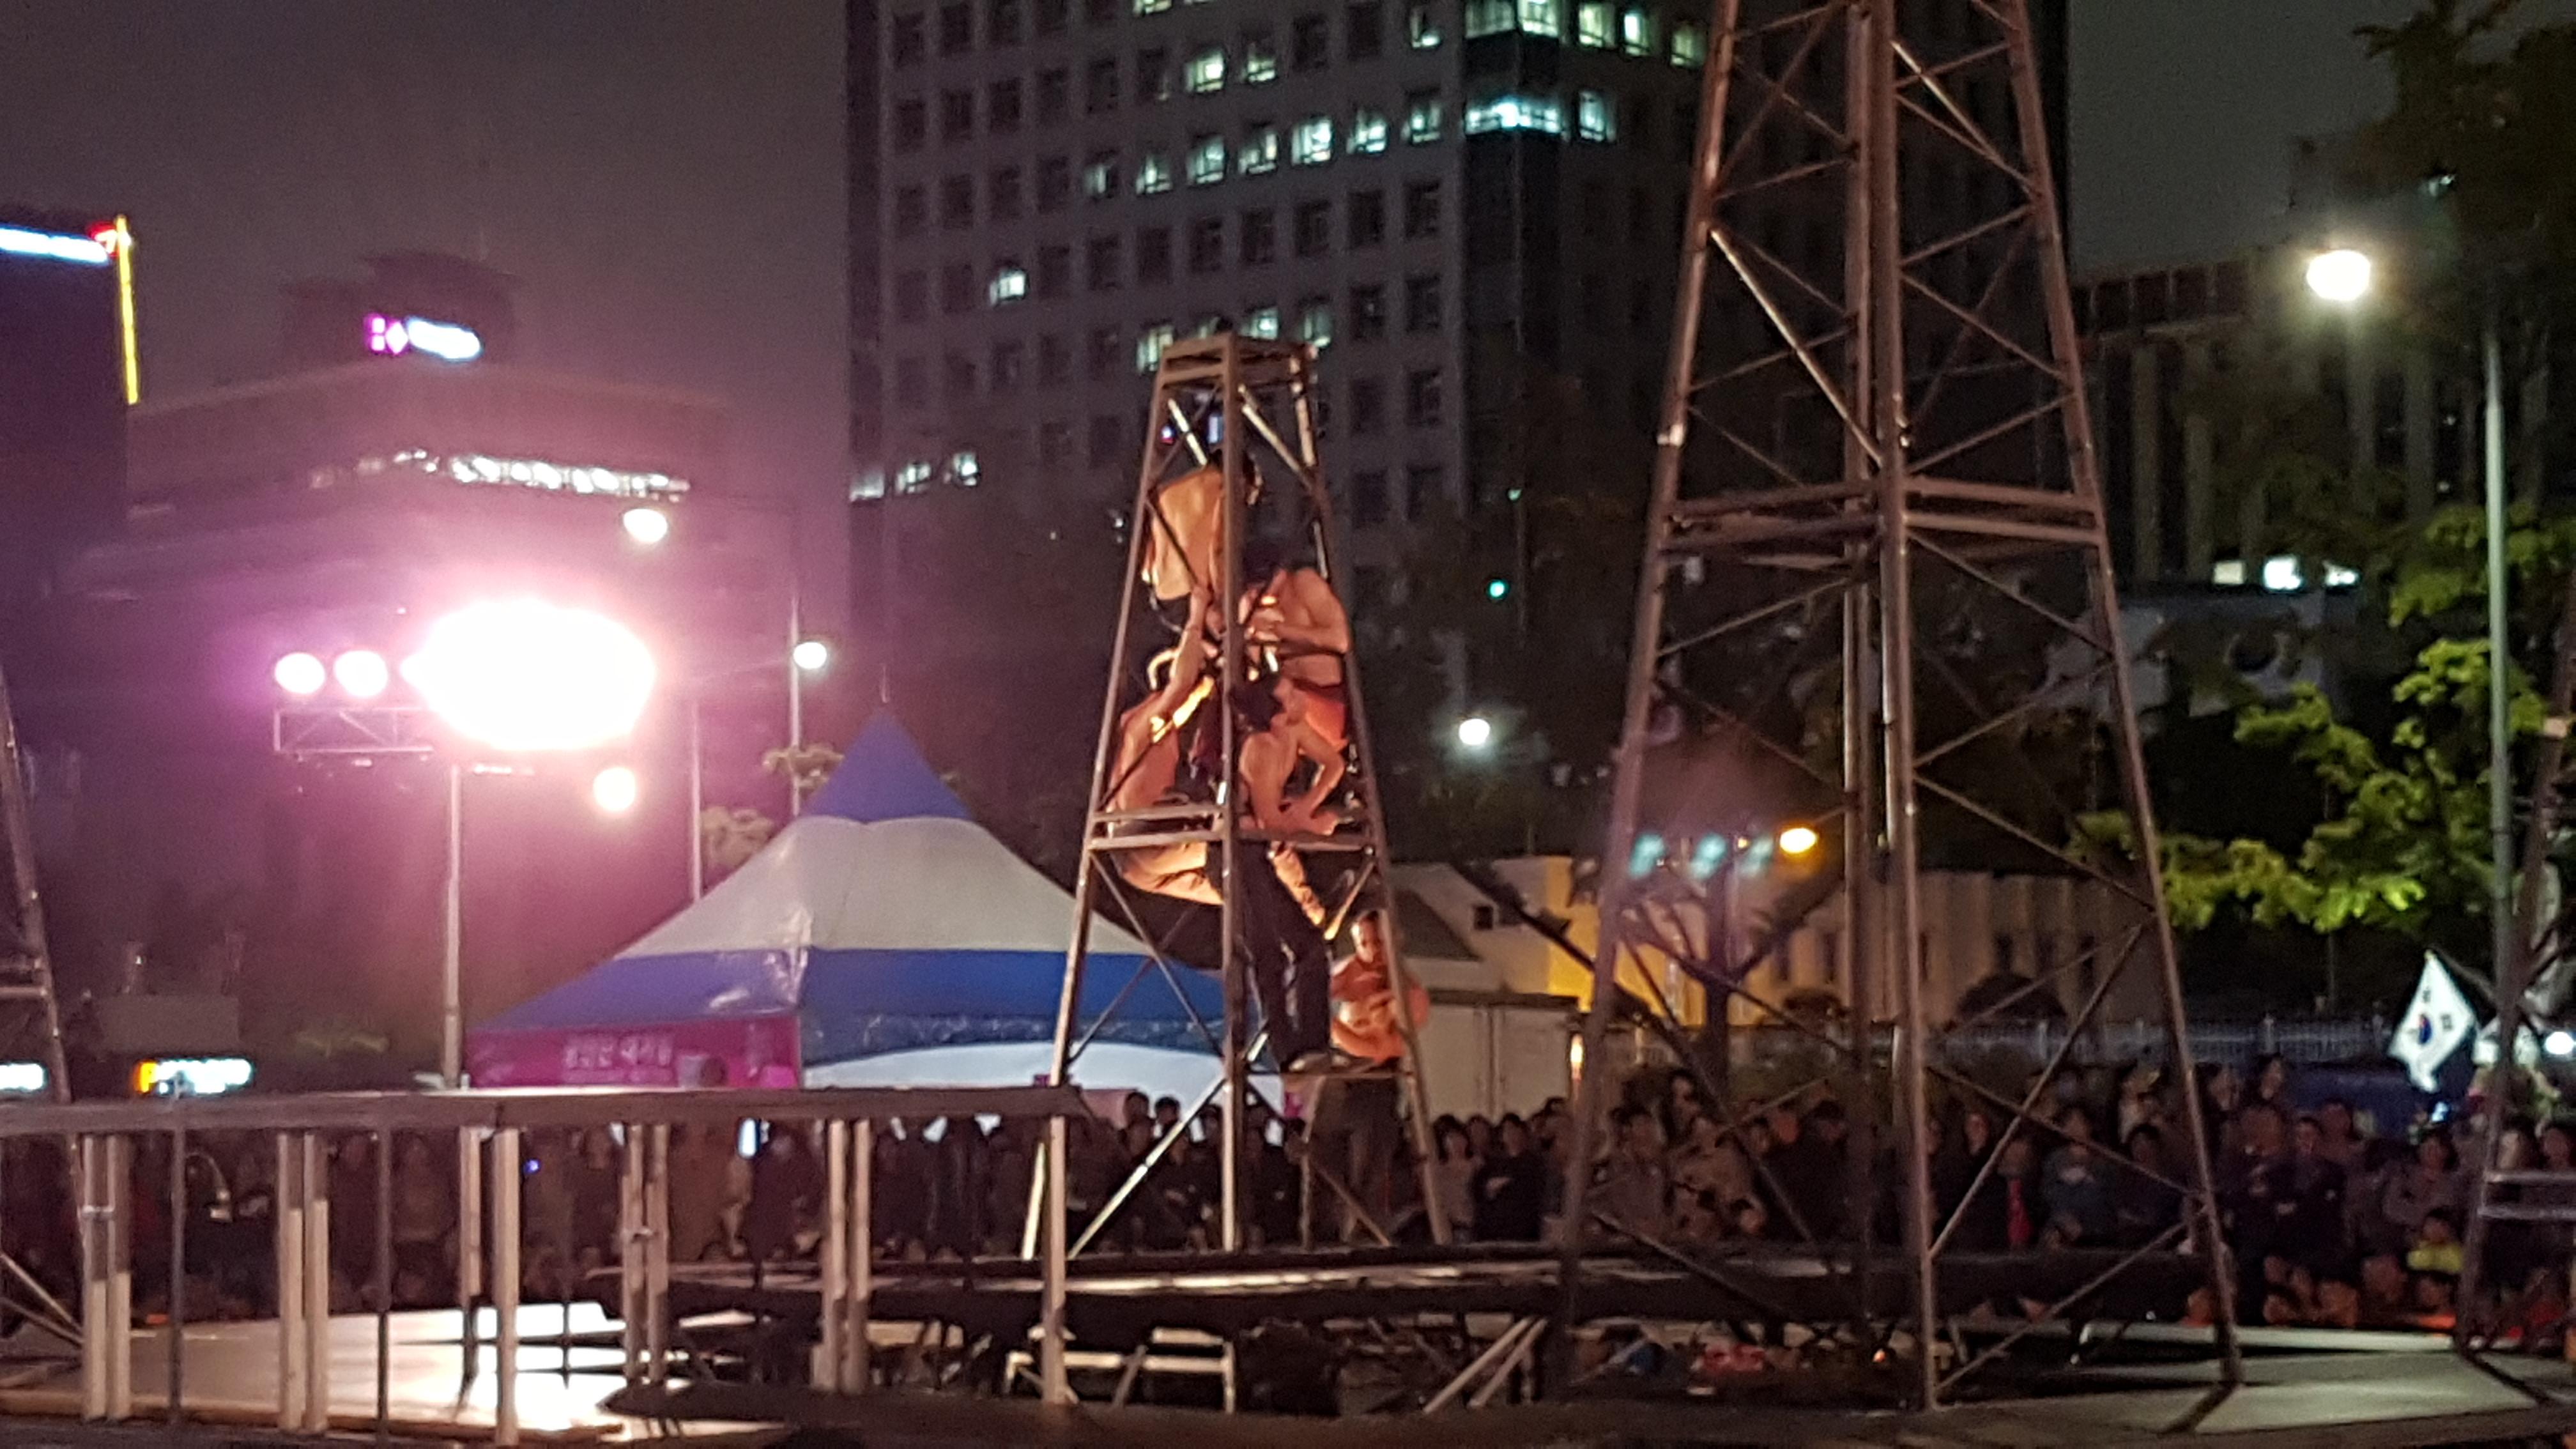 gravity zero, gravity0, 공중부양, 공짜 공연, 광화문 광장, 그라비티 제로, 도옹 도옹, 묘기, 무대인사, 무료 공연, 방방, 방방 묘기, 상의탈의, 서울 거리 예술축제, 서울 거리 예술축제 그라비티 Zero (Gravity0) @ 광화문 광장, 음악, 트램펄린, 퍼포먼스, 행위예술, 현대무용, 현대미술, 협동